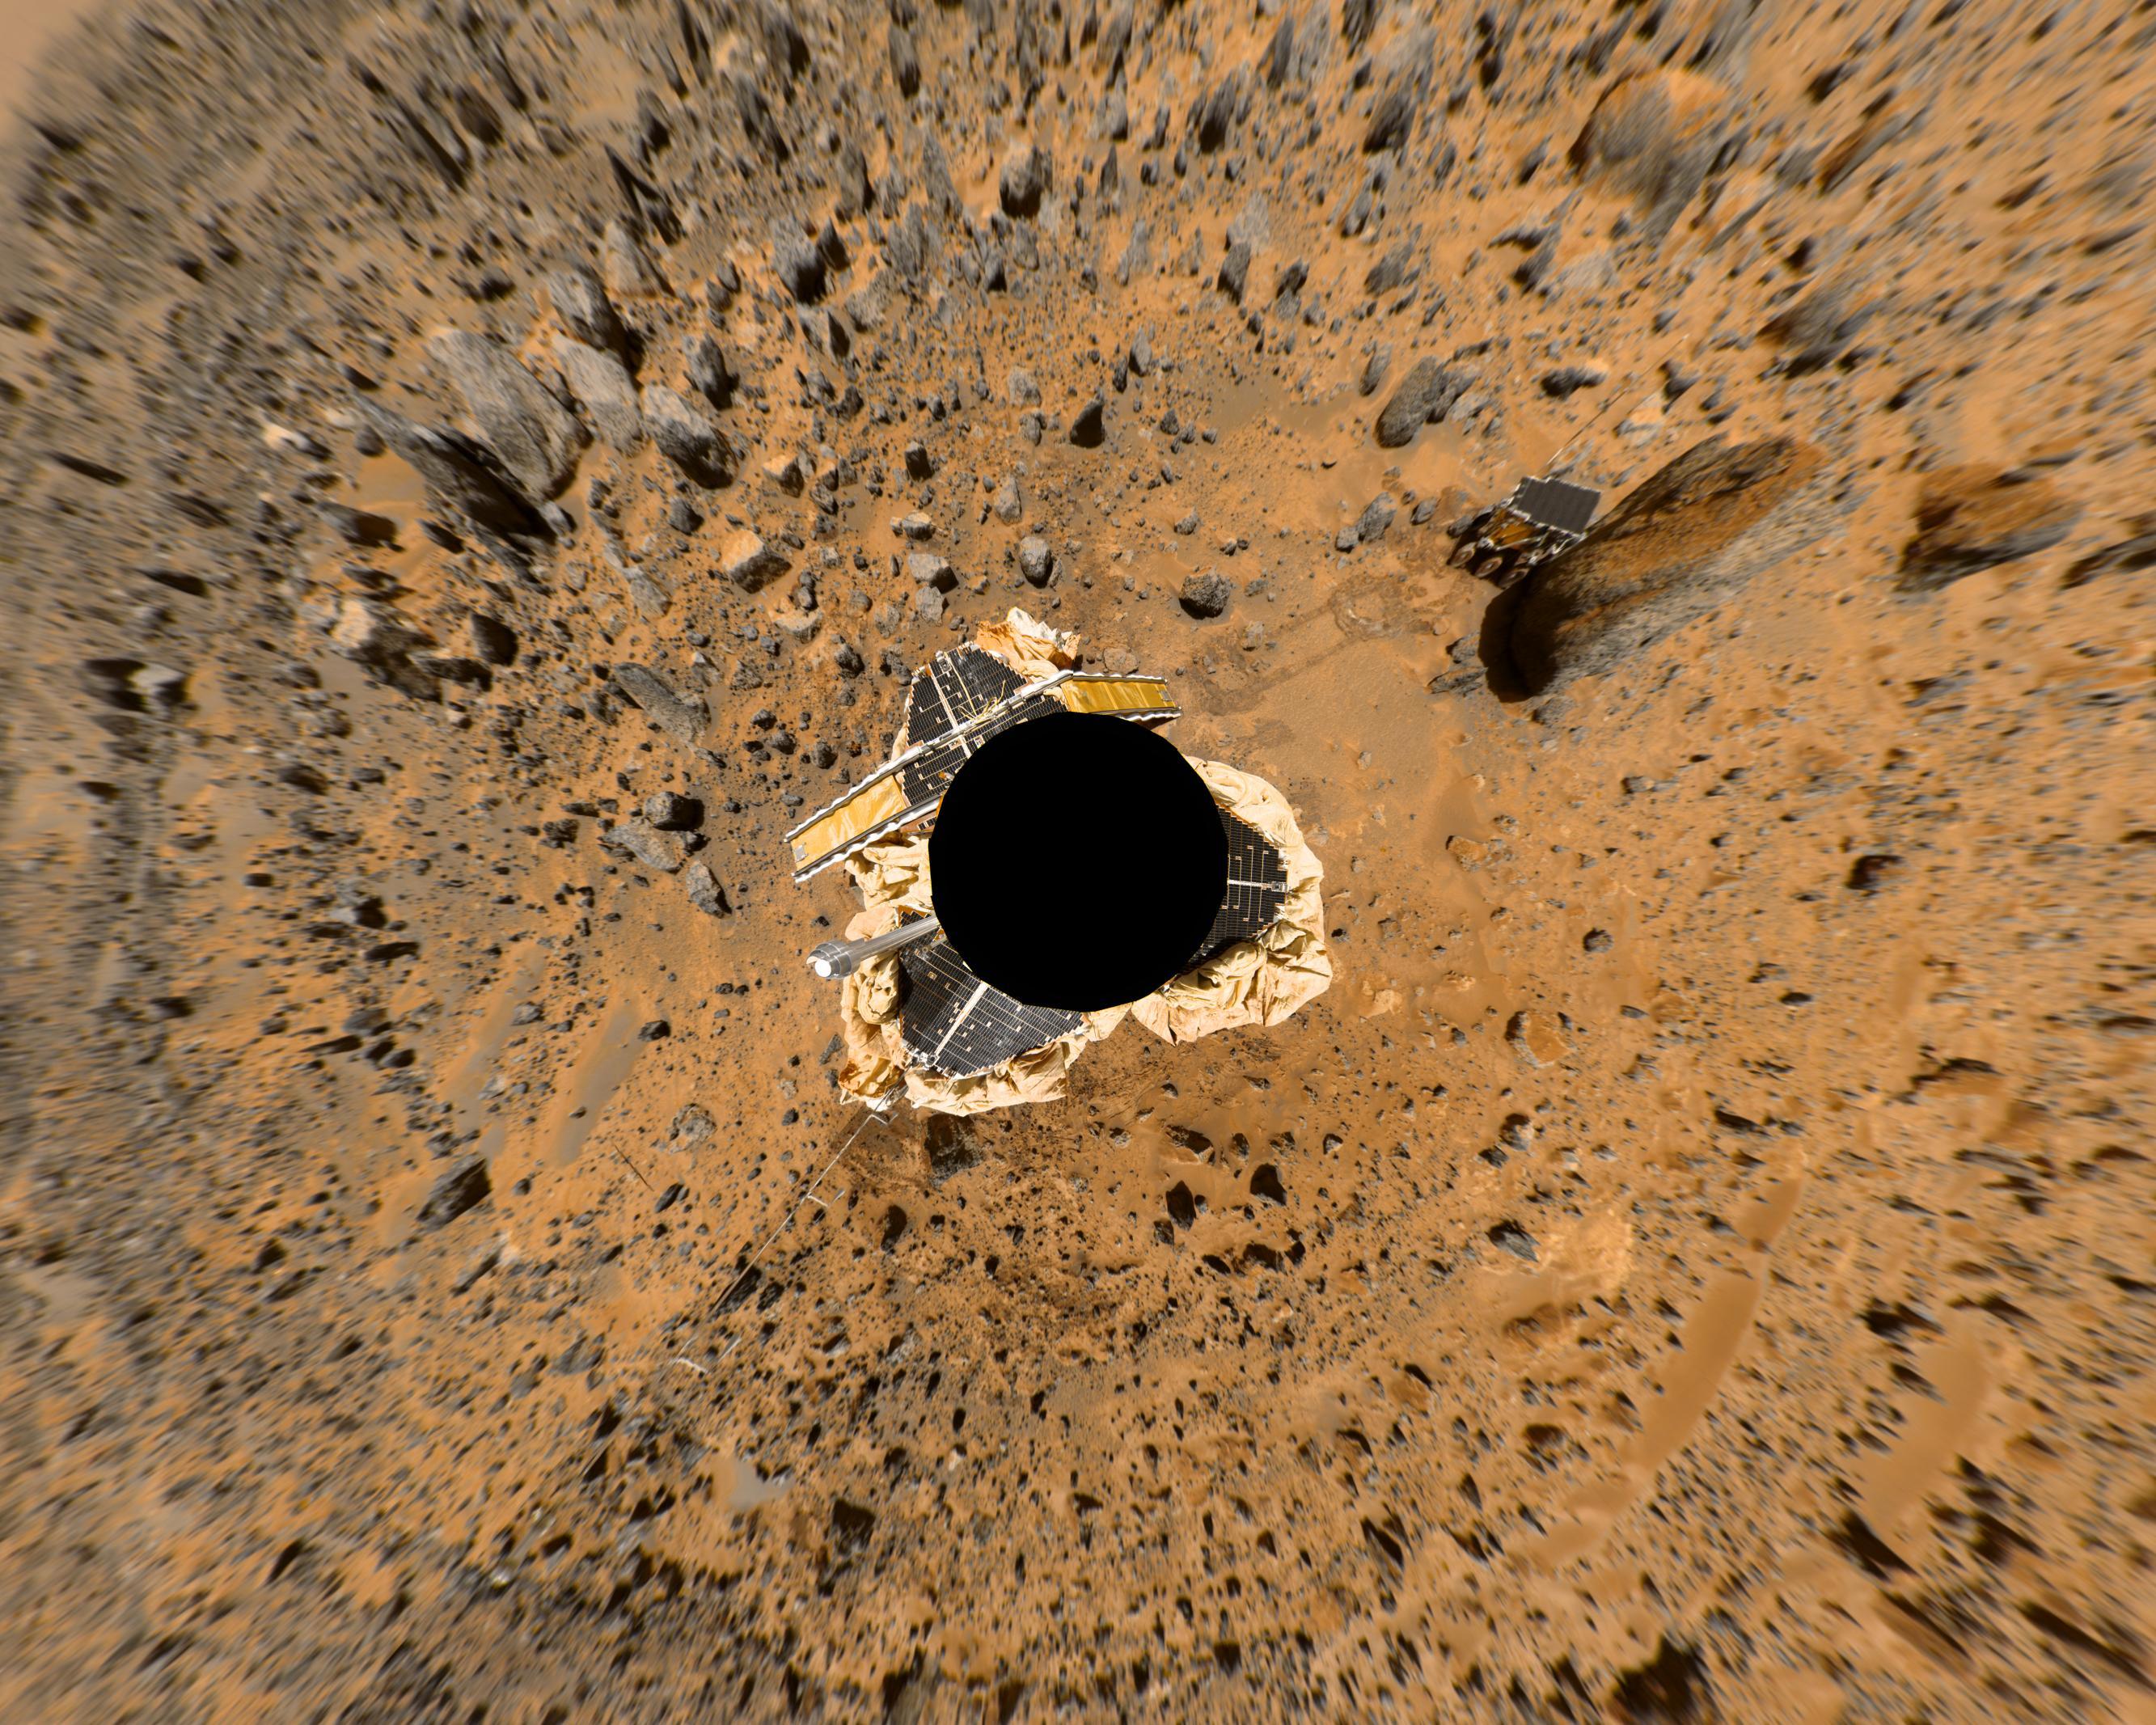 nasa brings mars landing to viewers everywhere - photo #46